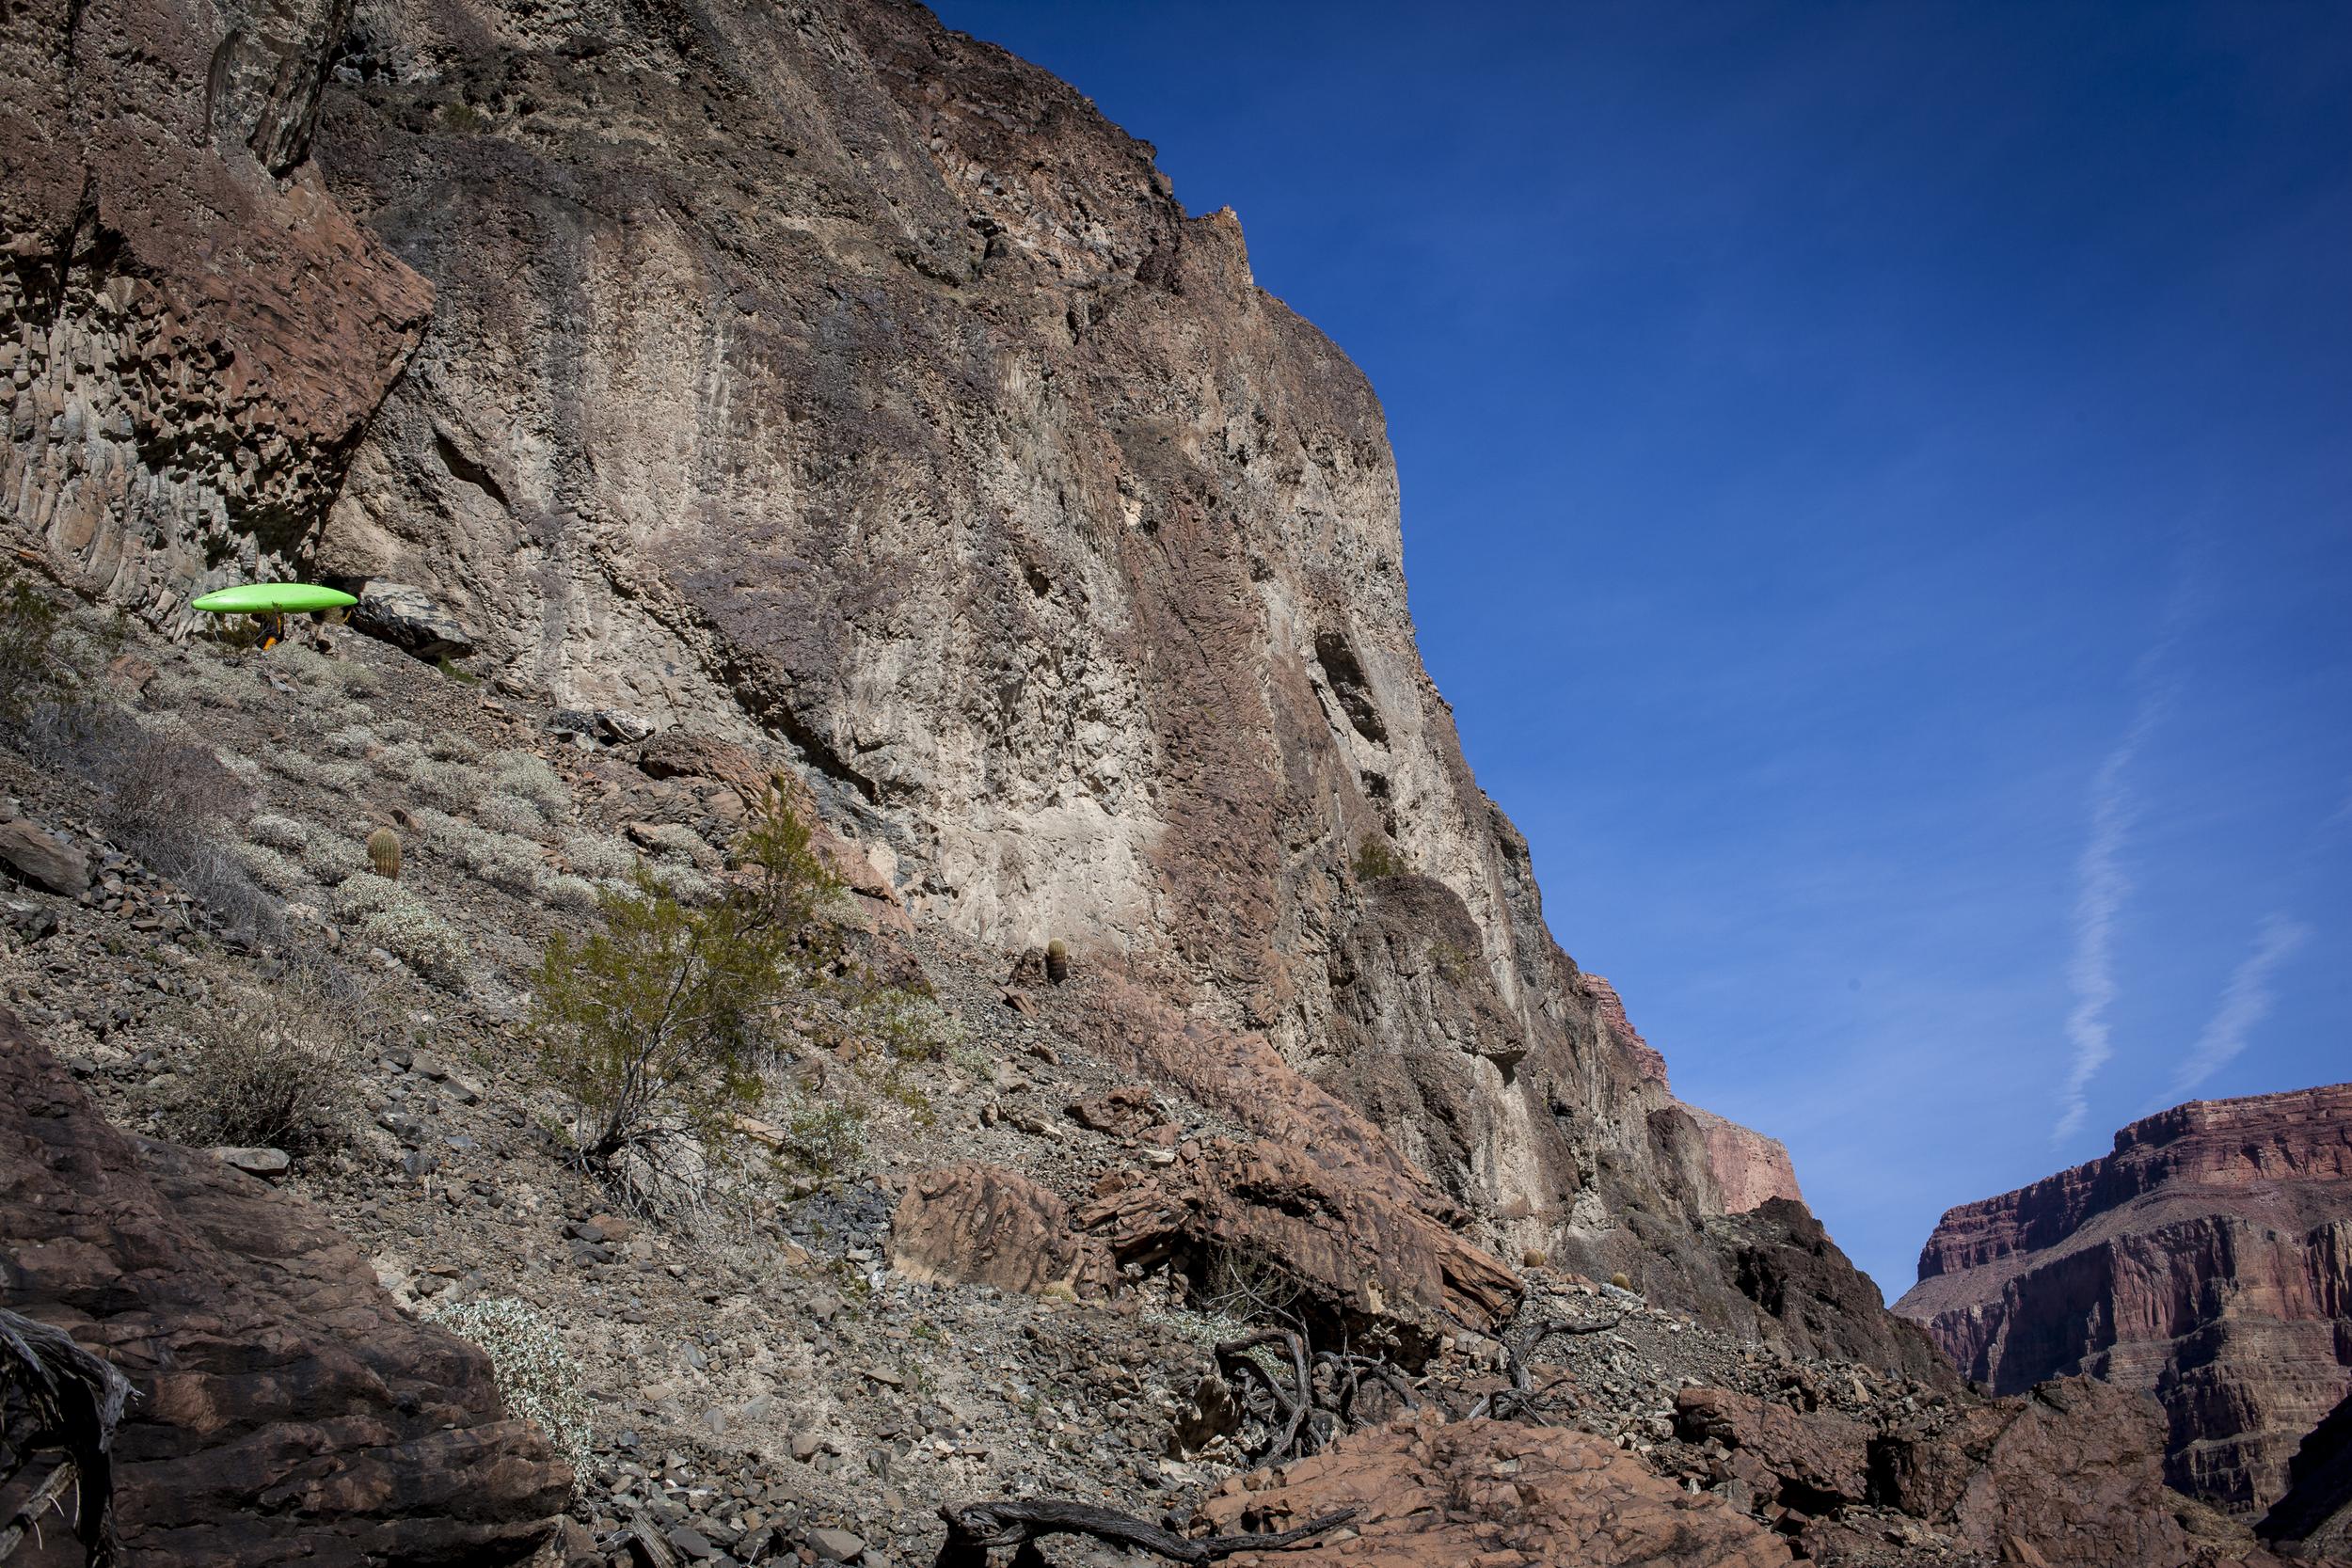 John Nestler carrying back upLava Falls. Grand Canyon, AZ. Credit: Robb Goodell